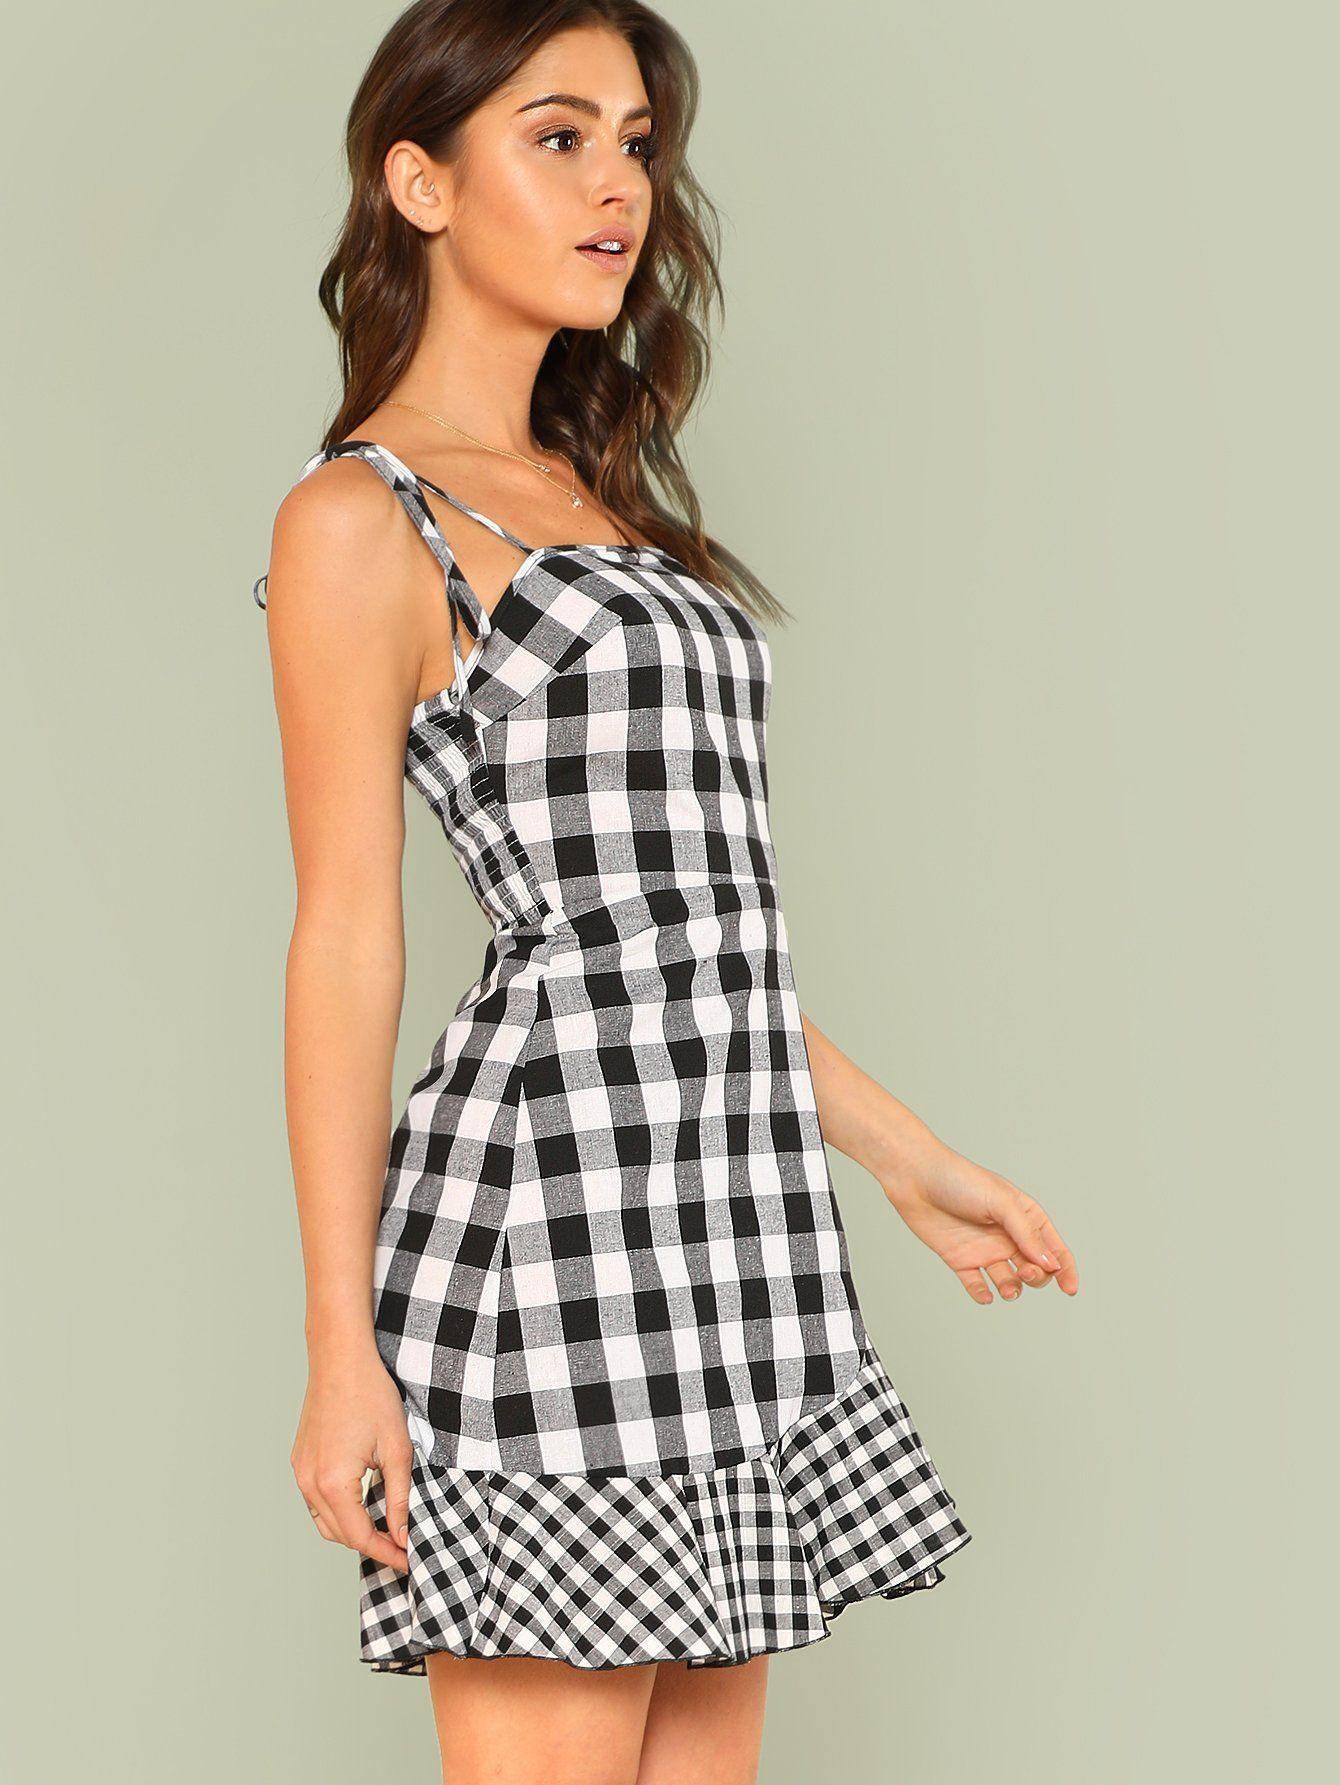 d344a8adc0 Asymmetrical Ruffle Hem Gingham Tied Cami Dress -SheIn(Sheinside ...